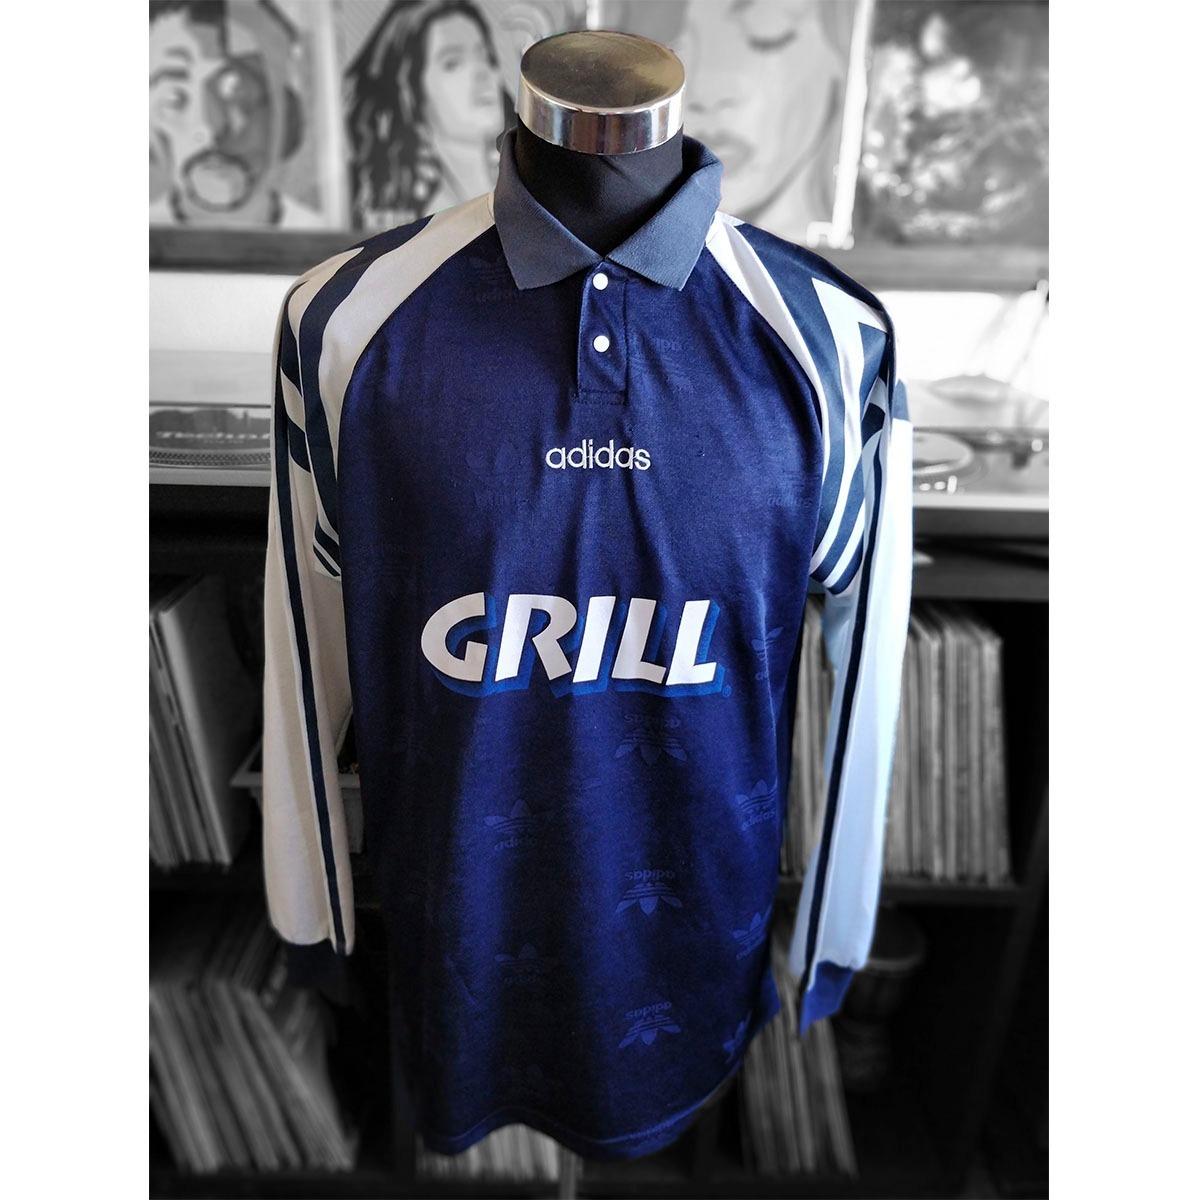 Camiseta Fútbol adidas Equipment Vintage 90 s 02a9922cbac92